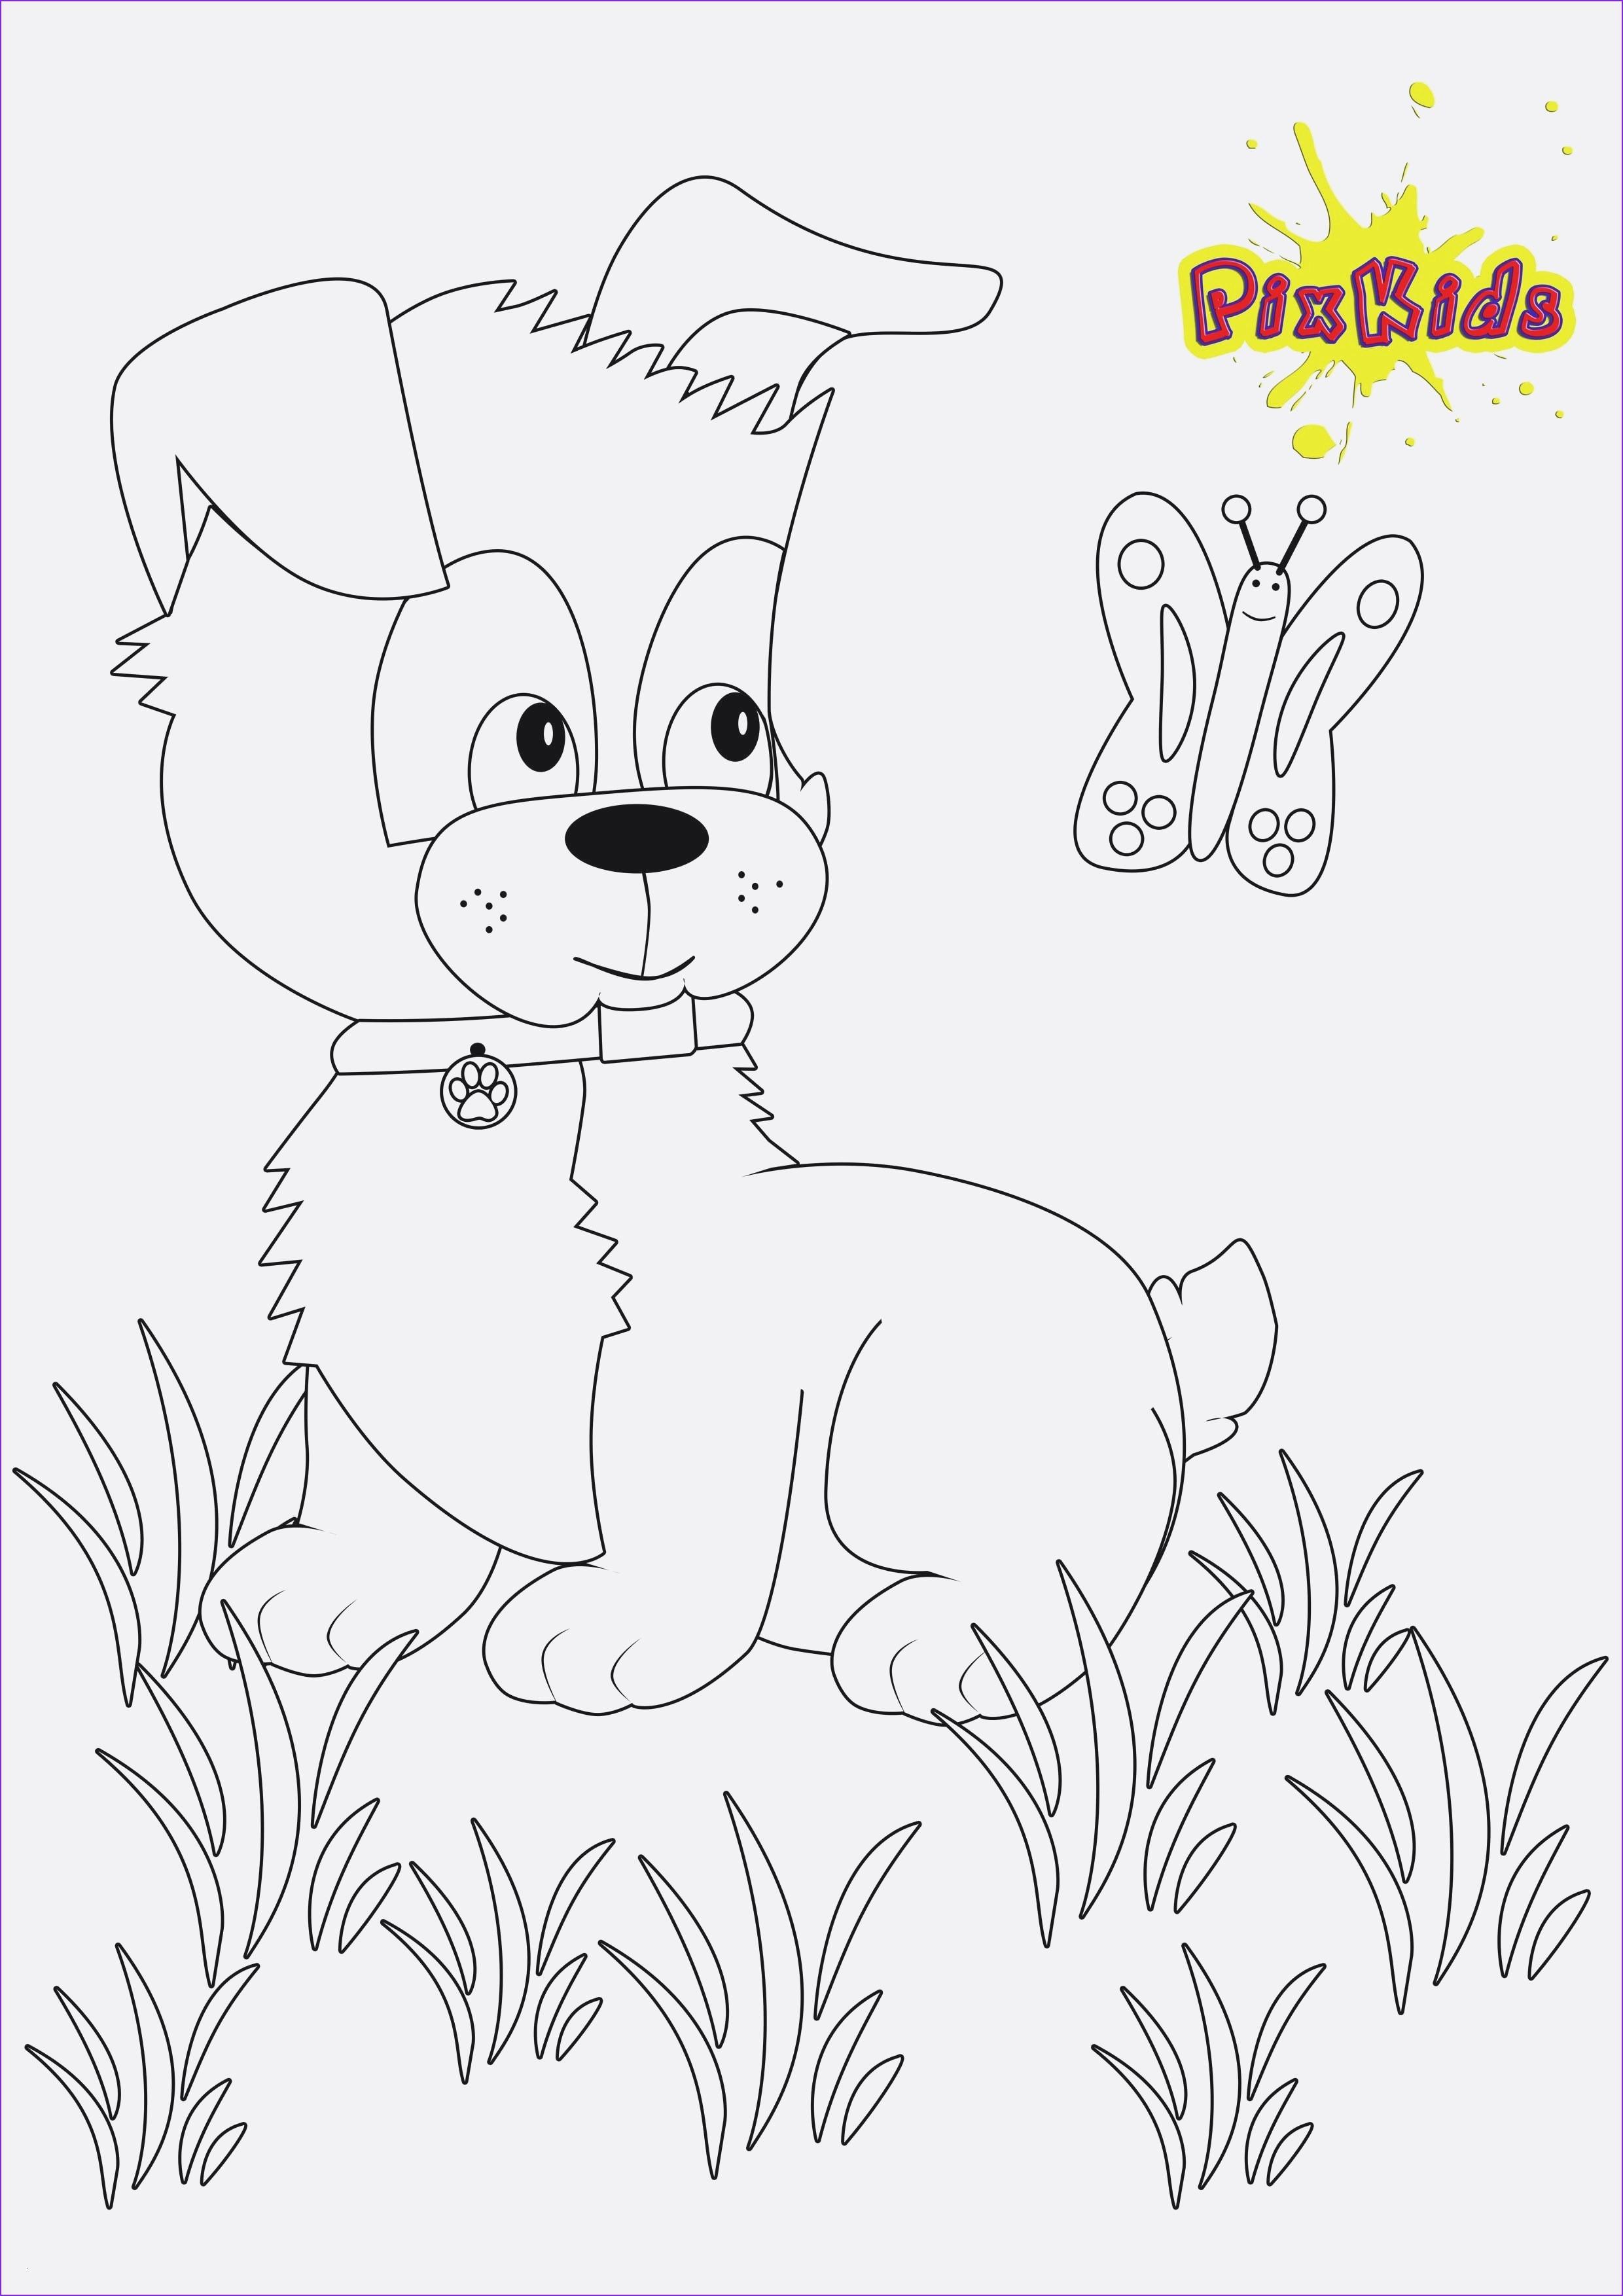 Ausmalbild Mandala Eule Das Beste Von 40 Hund Ausmalbilder Scoredatscore Schön Eulen Ausmalbilder Mandala Bild